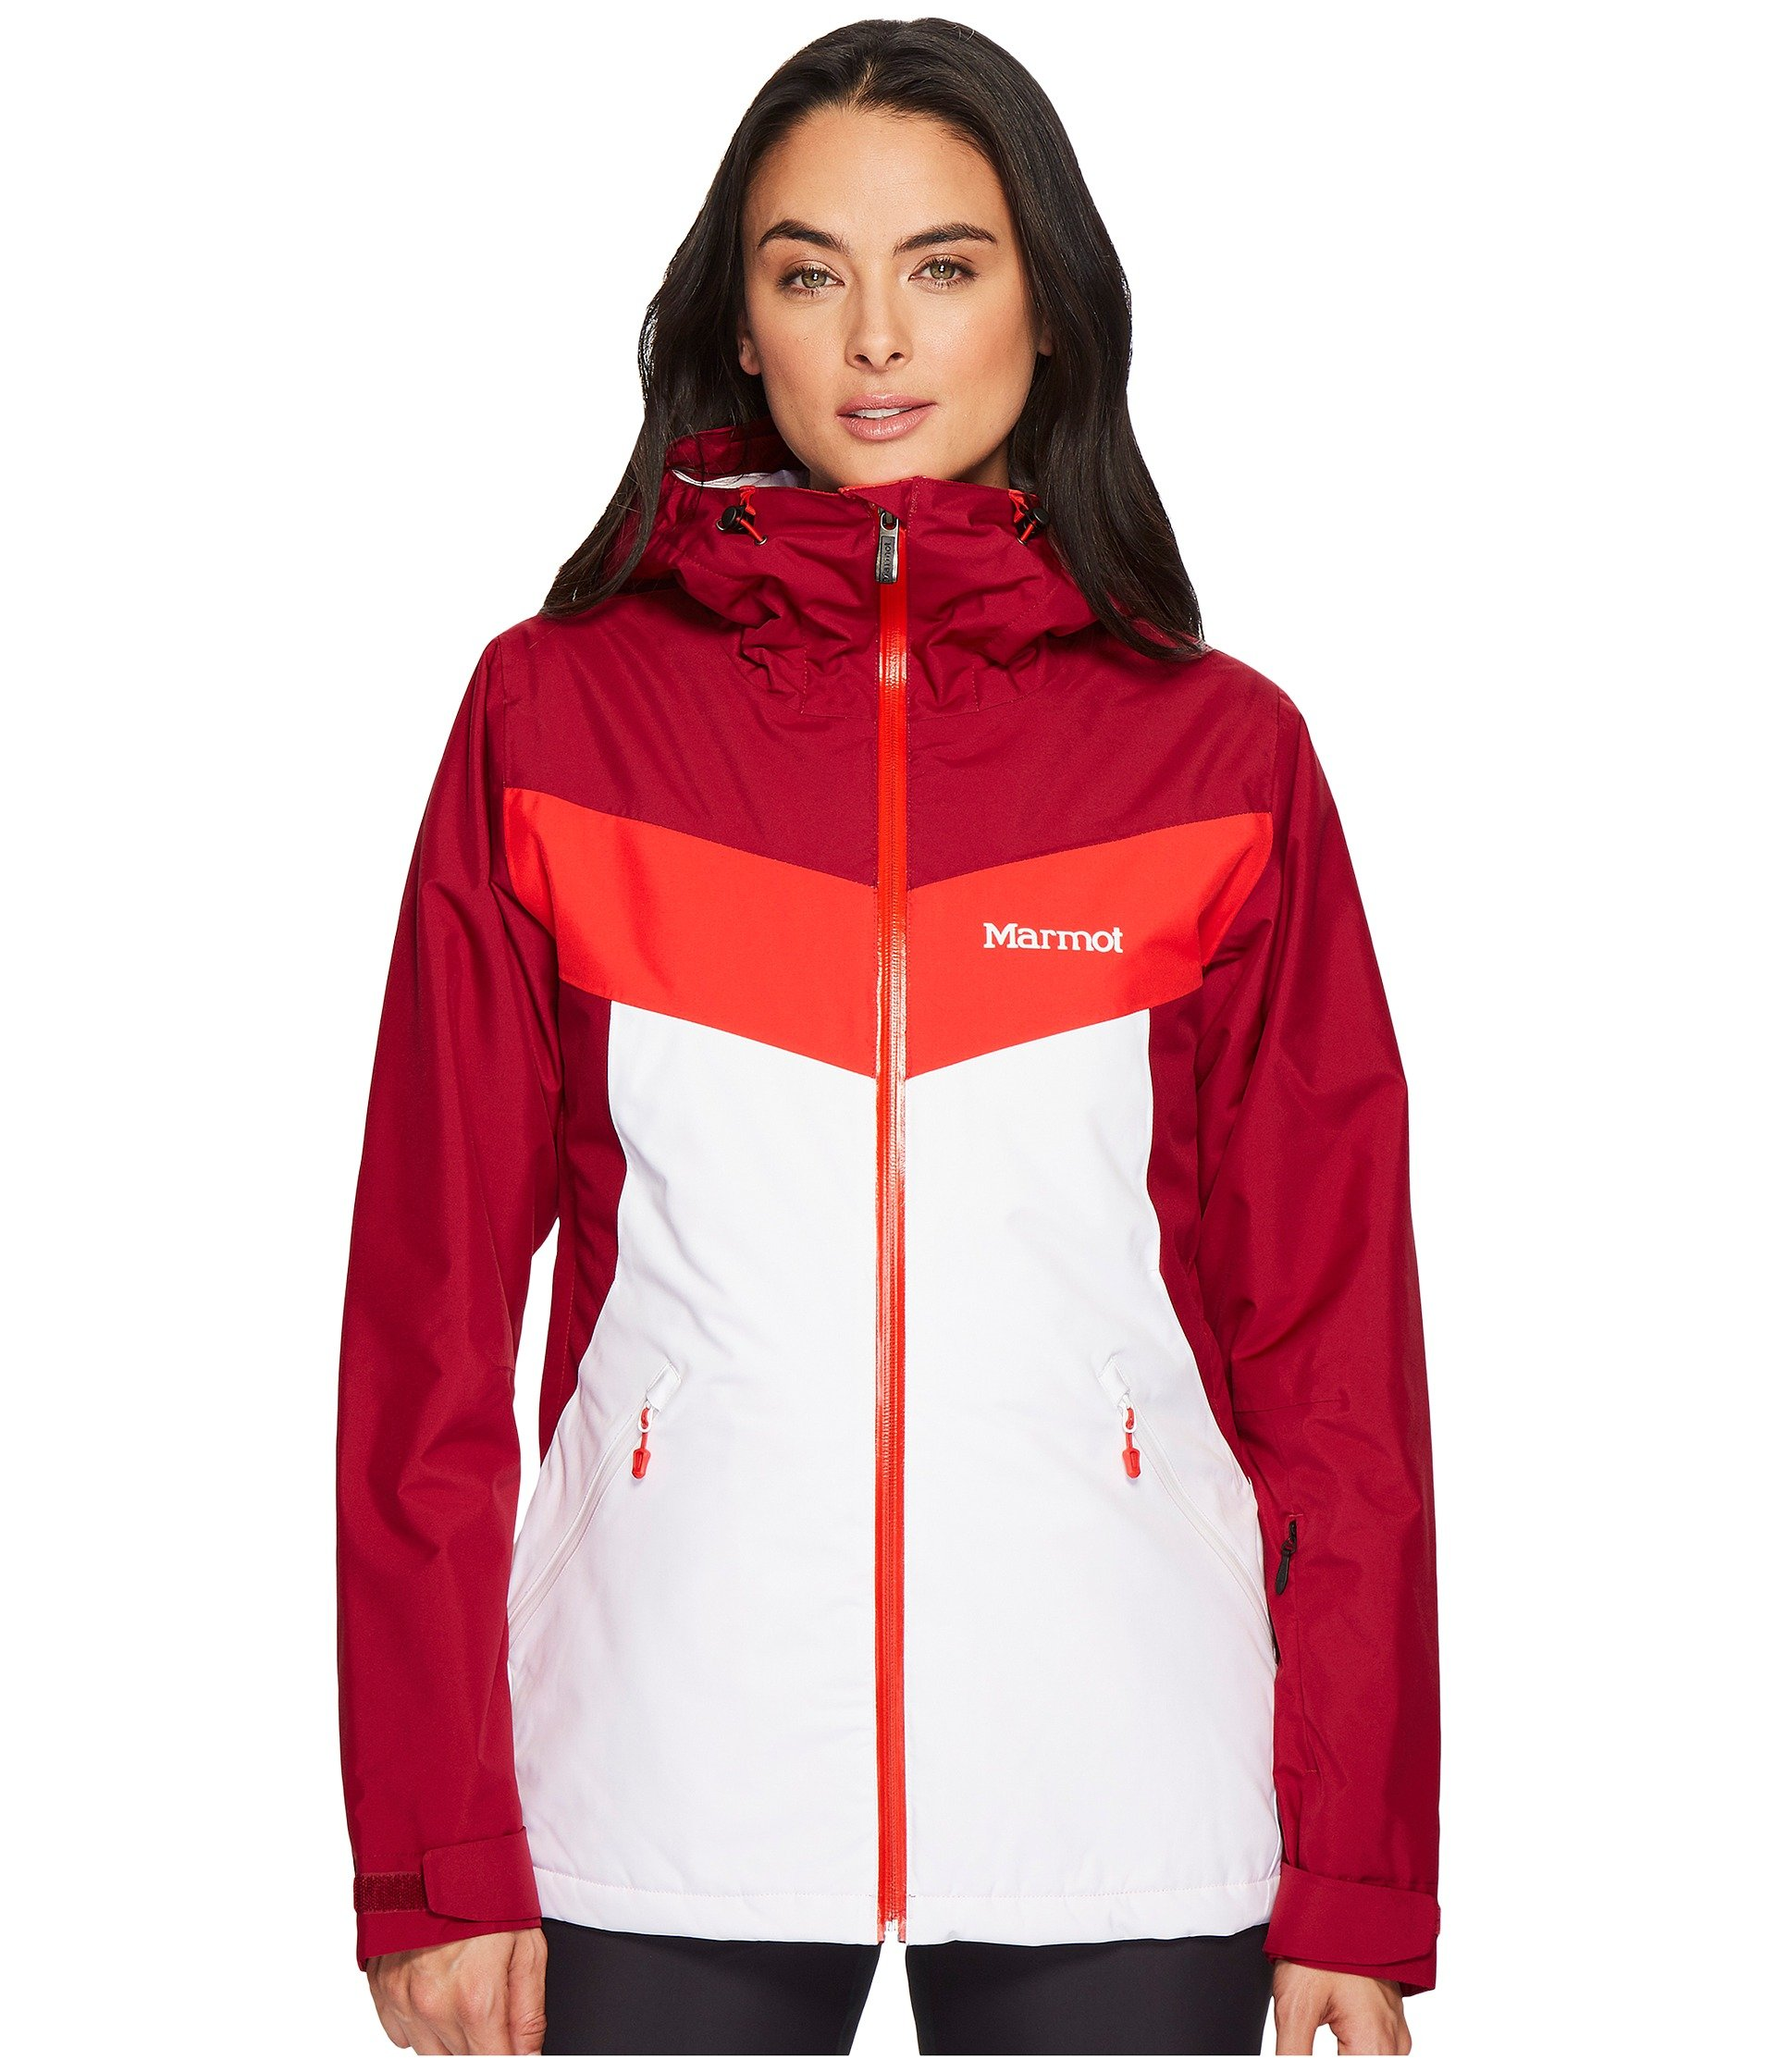 Ambrosia Jacket